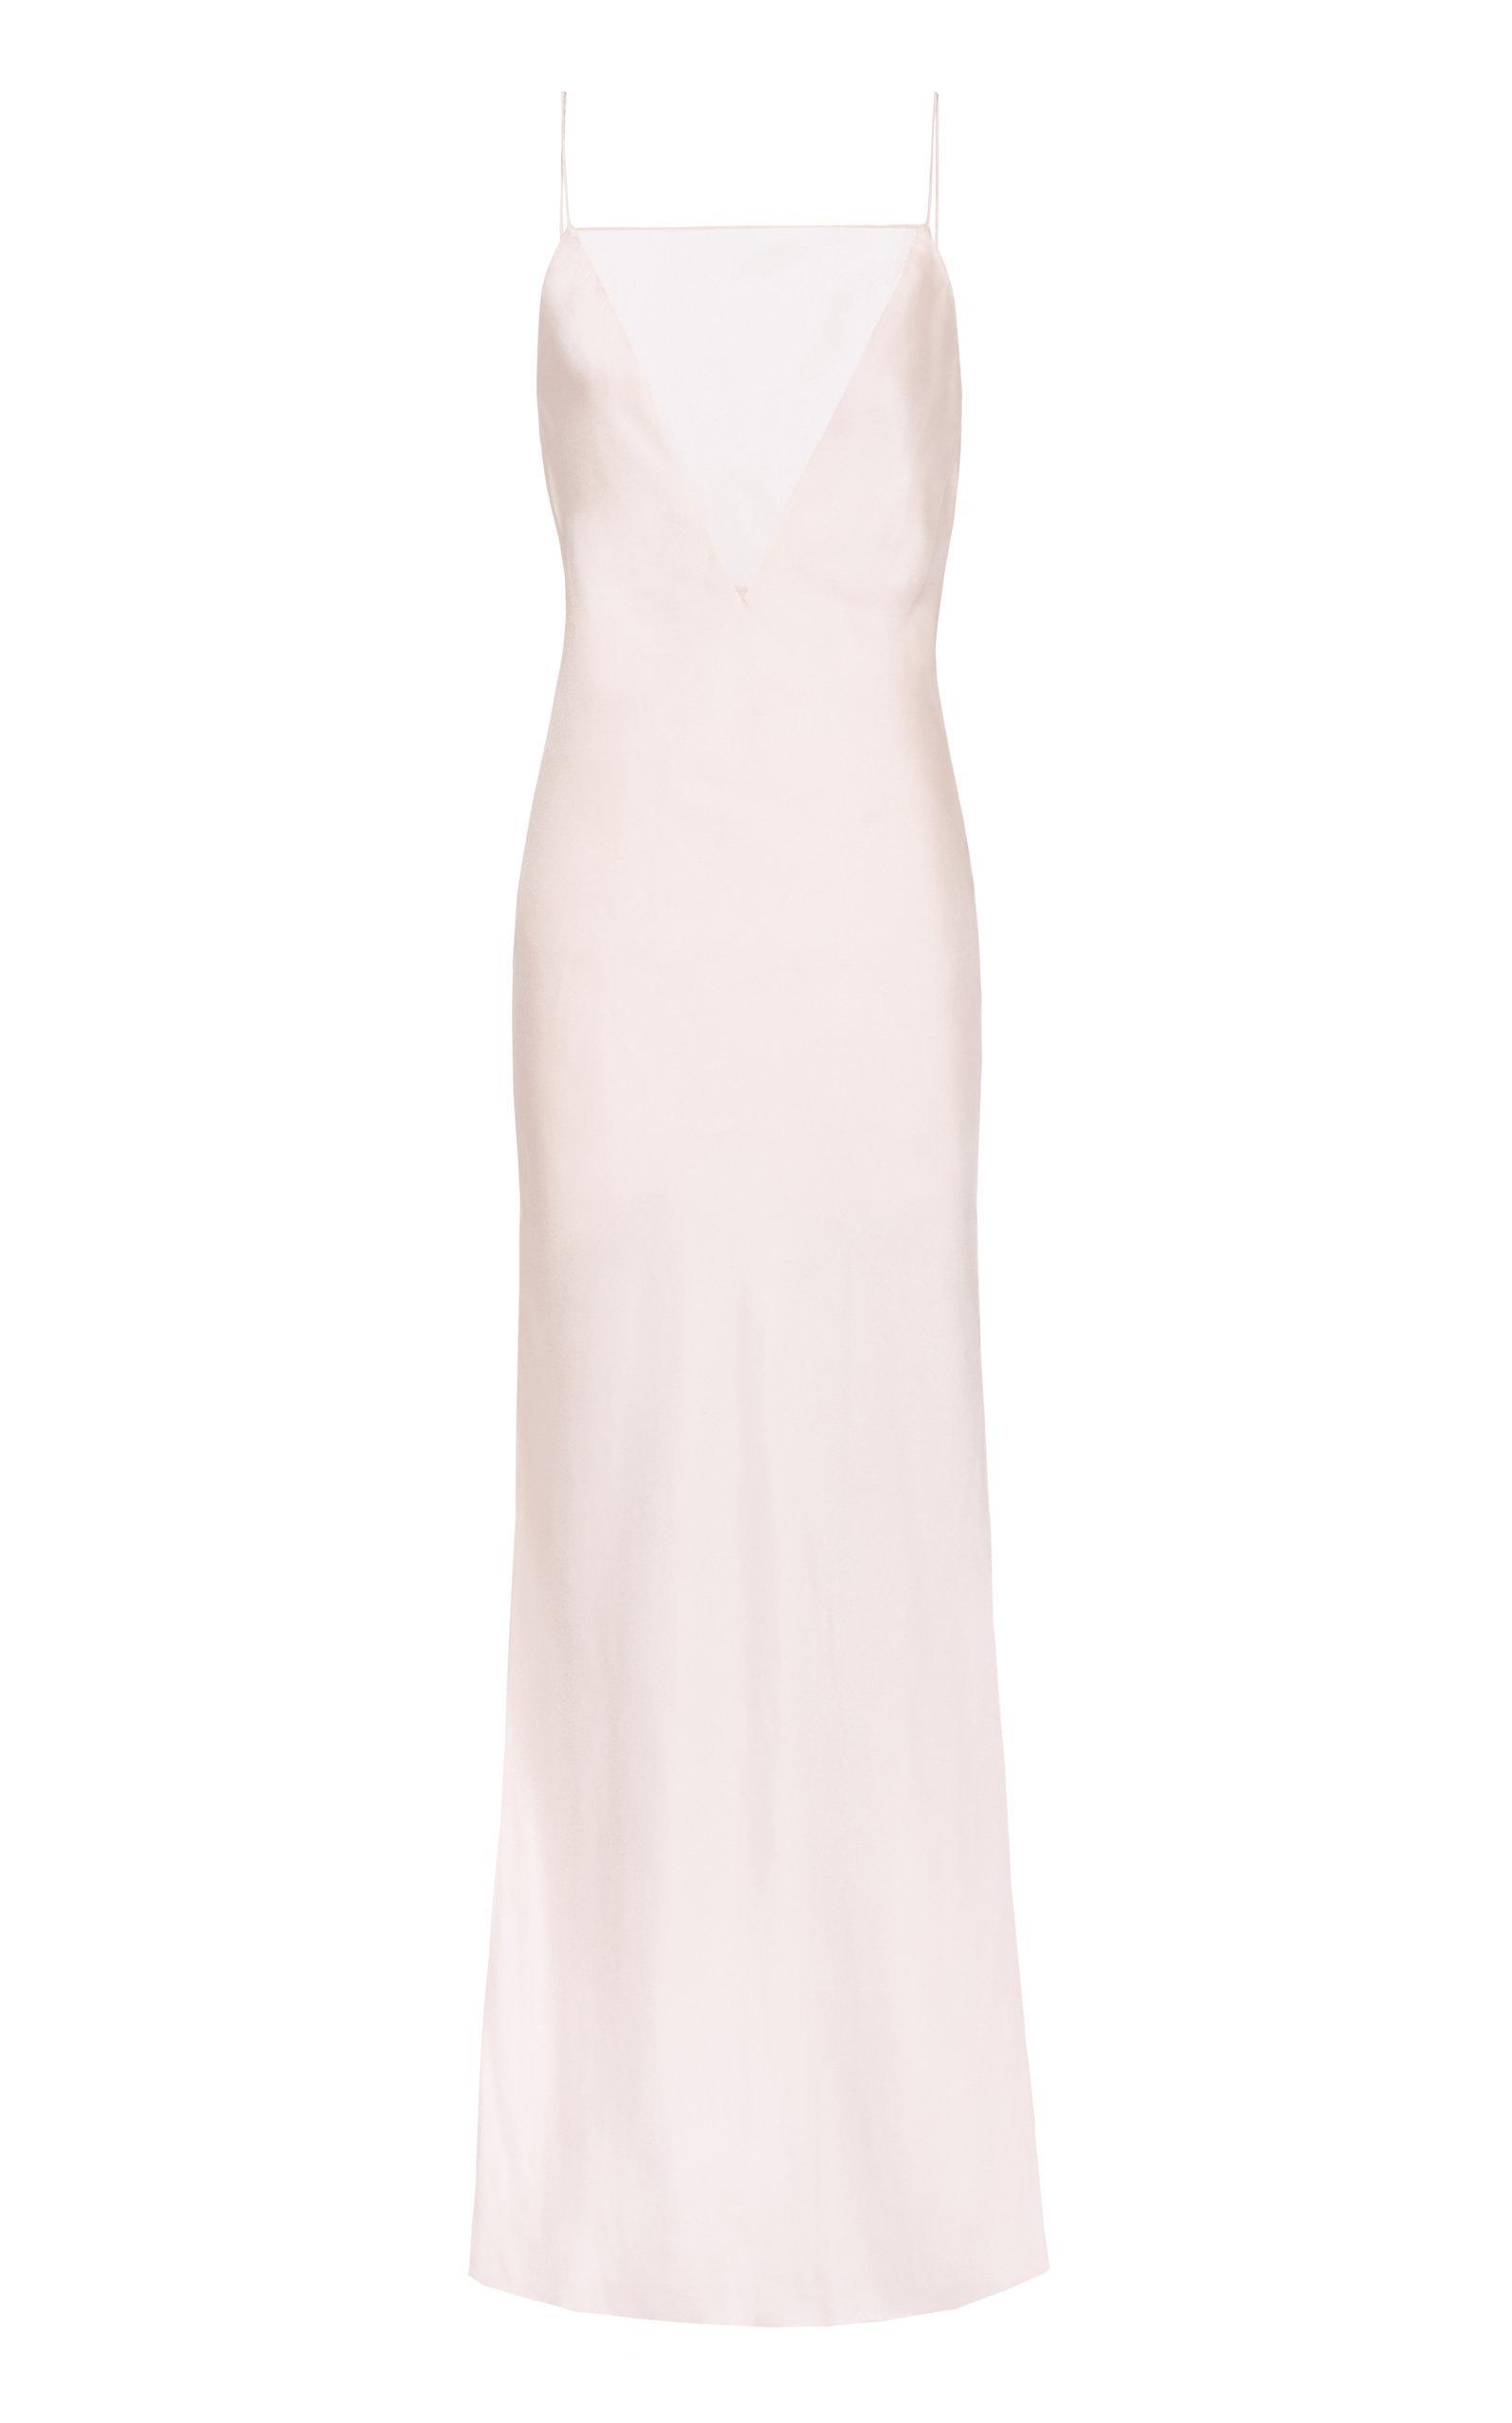 66f14f25839 Lyst - Marina Moscone Gia Slip Dress in Pink